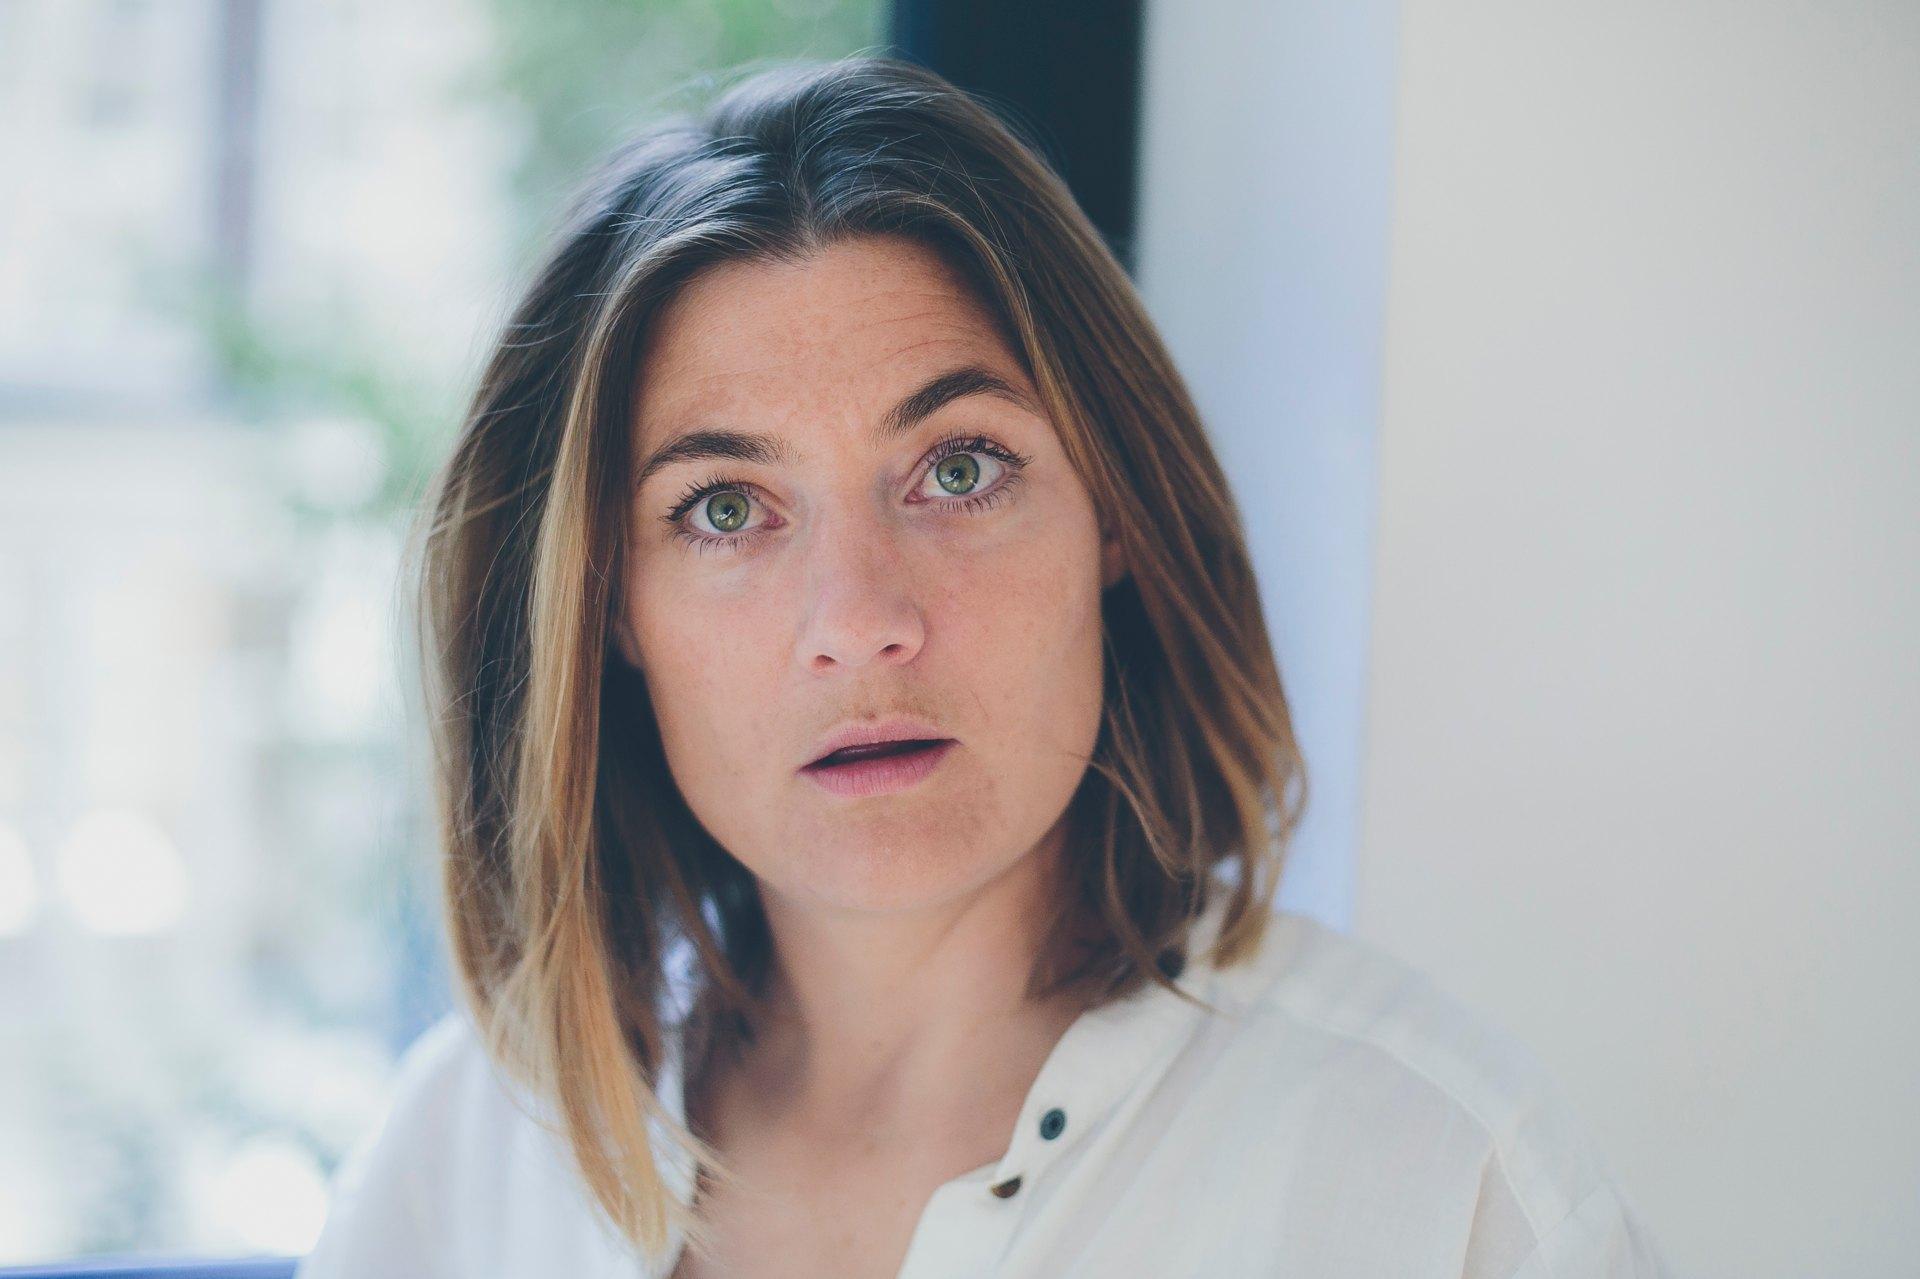 Hanneke_Scholten_Actrice_Portret09